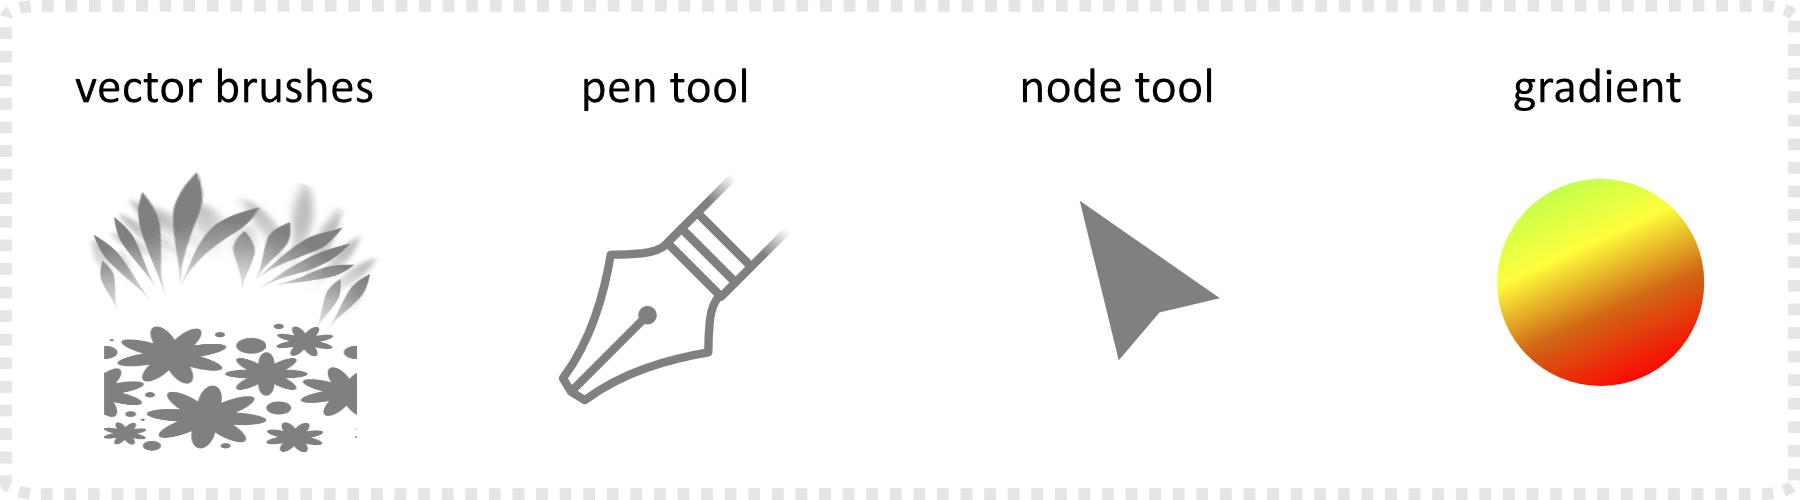 2dgameartguru - vector brush creation in Affinity Designer tools